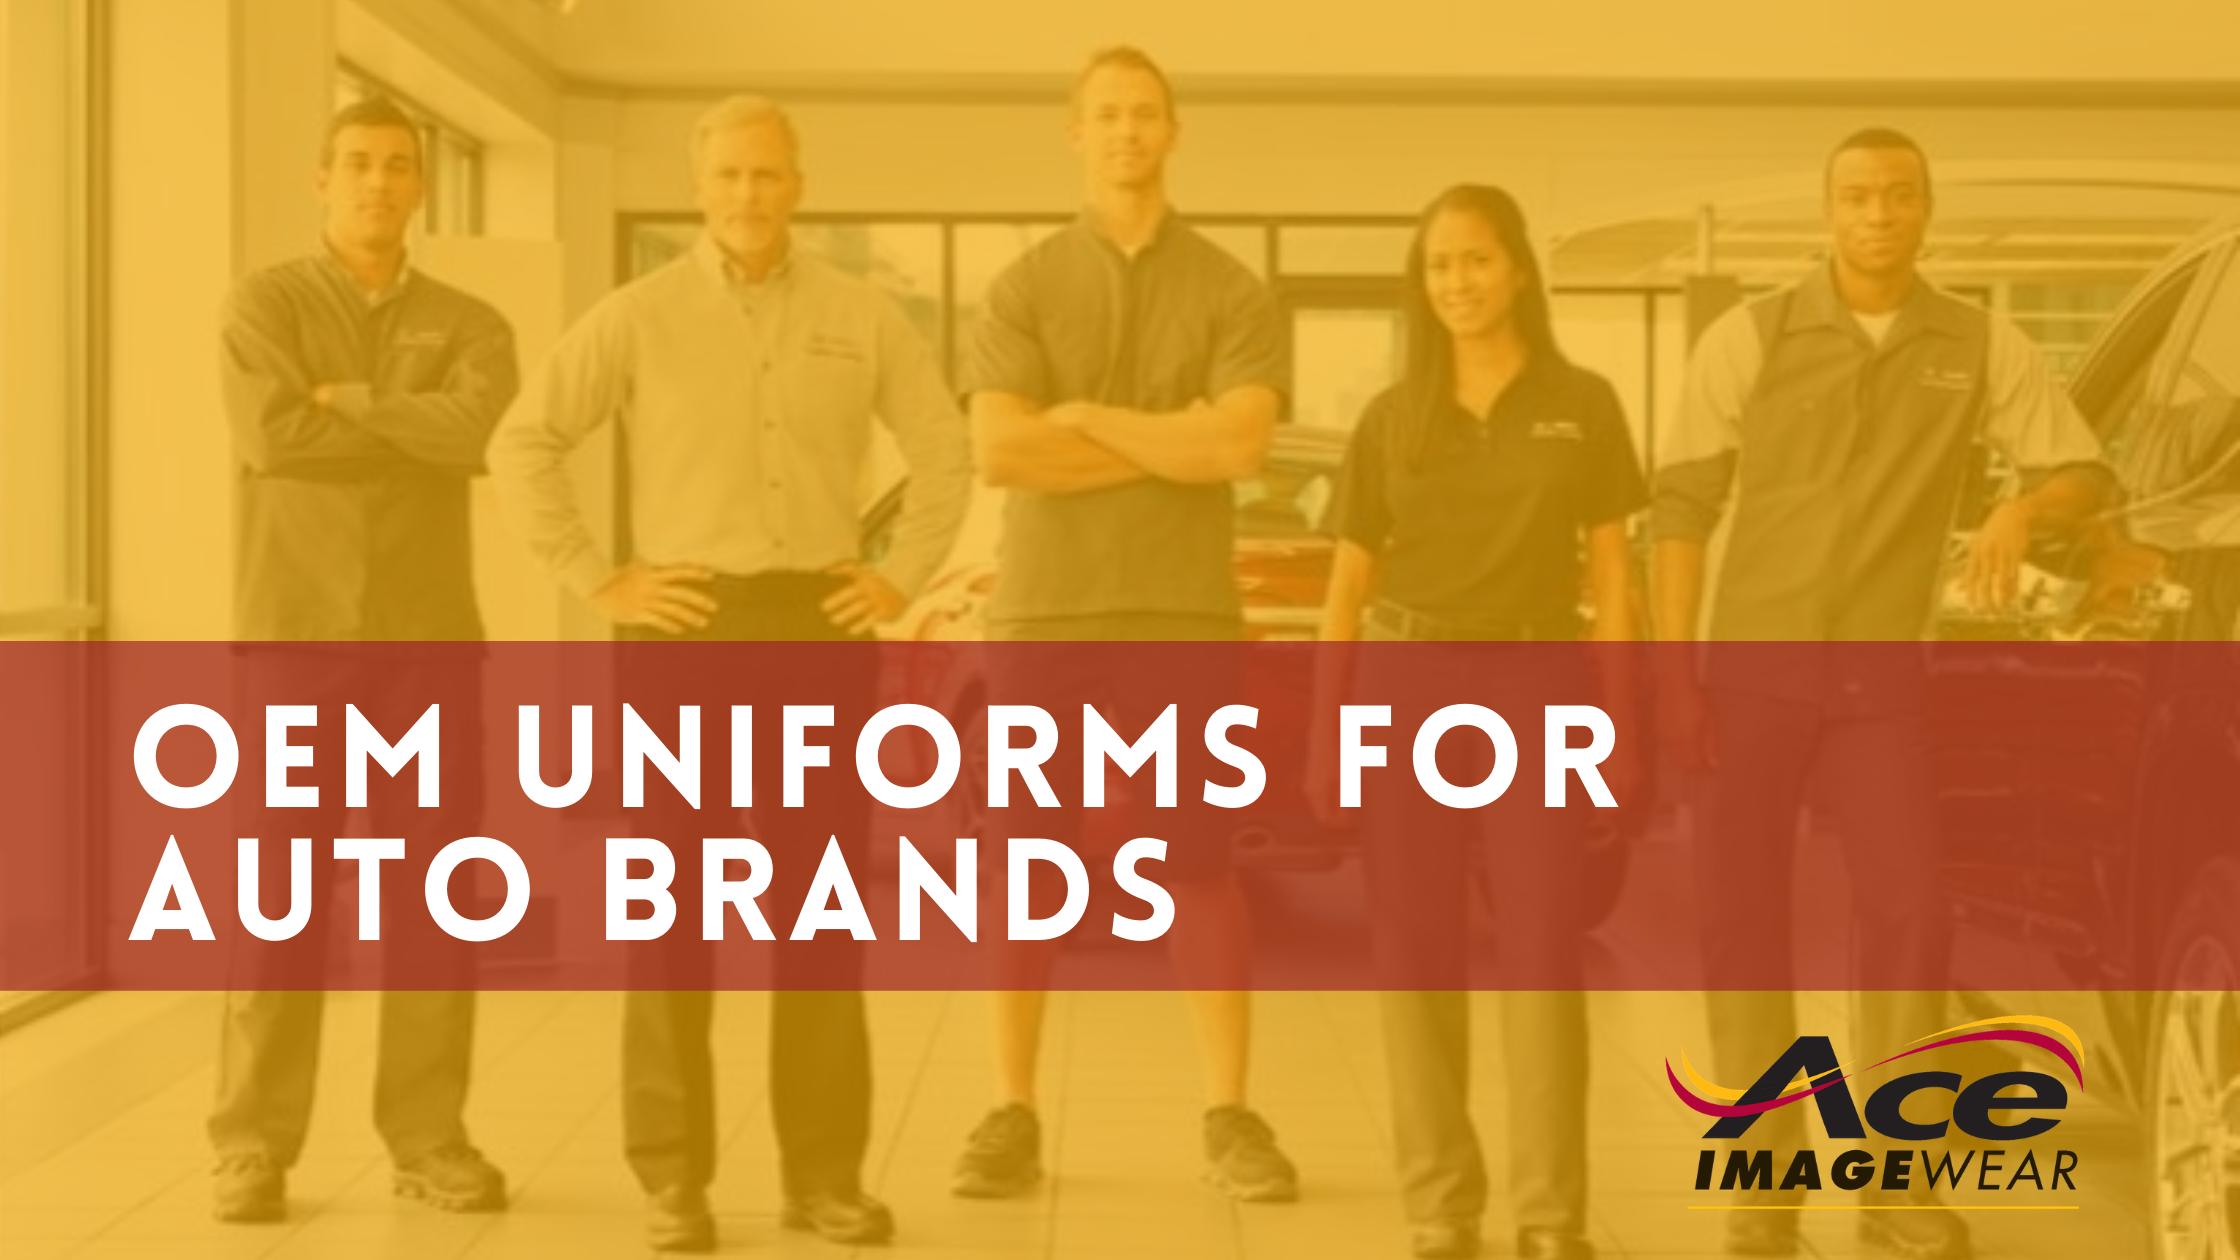 OEM Uniforms for Auto Brands